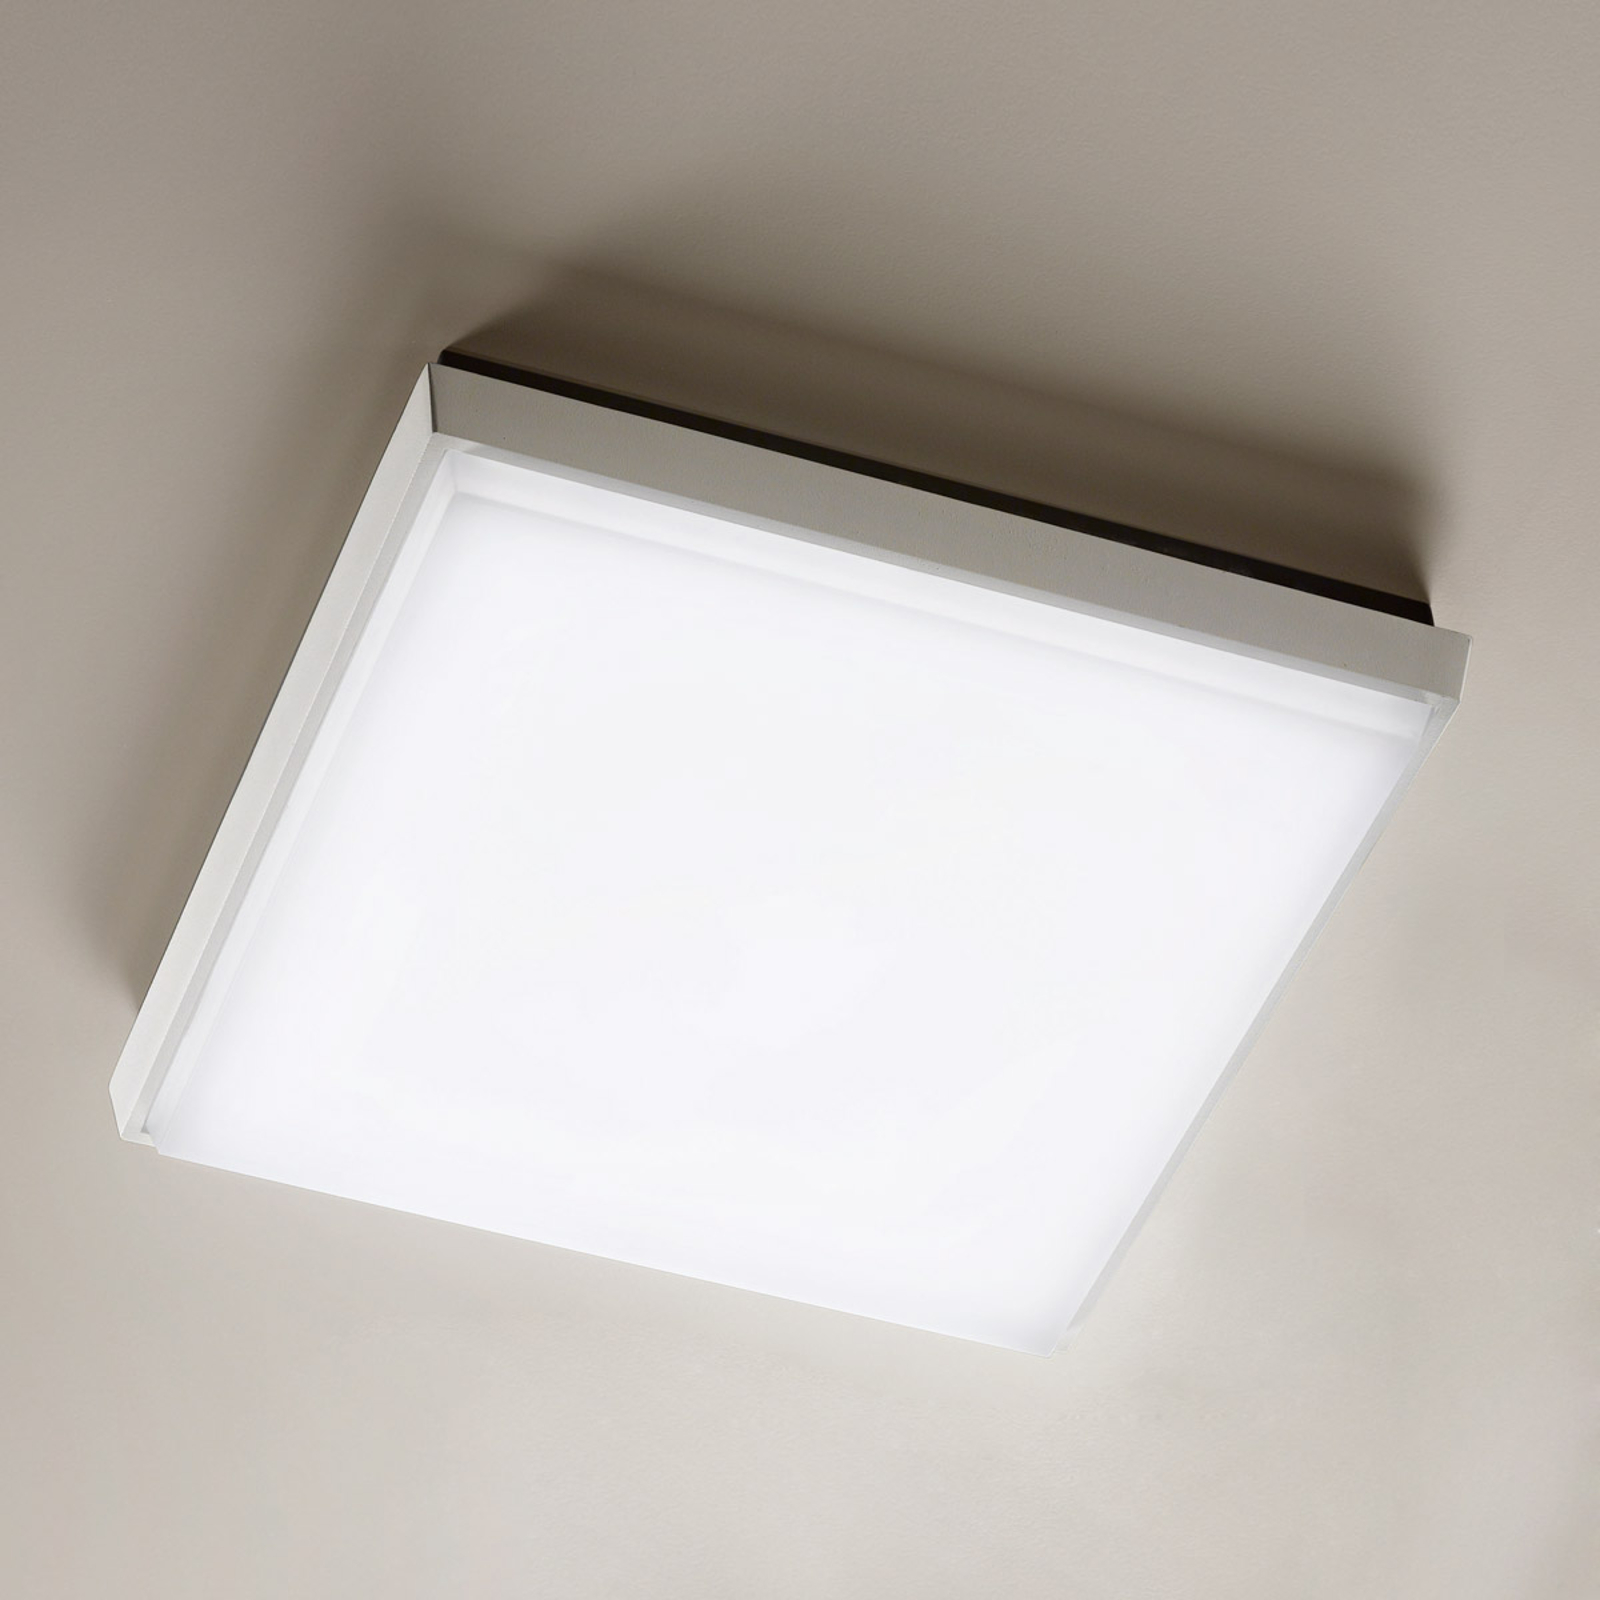 Prostokątna lampa sufitowa zewnętrzna LED Desdy